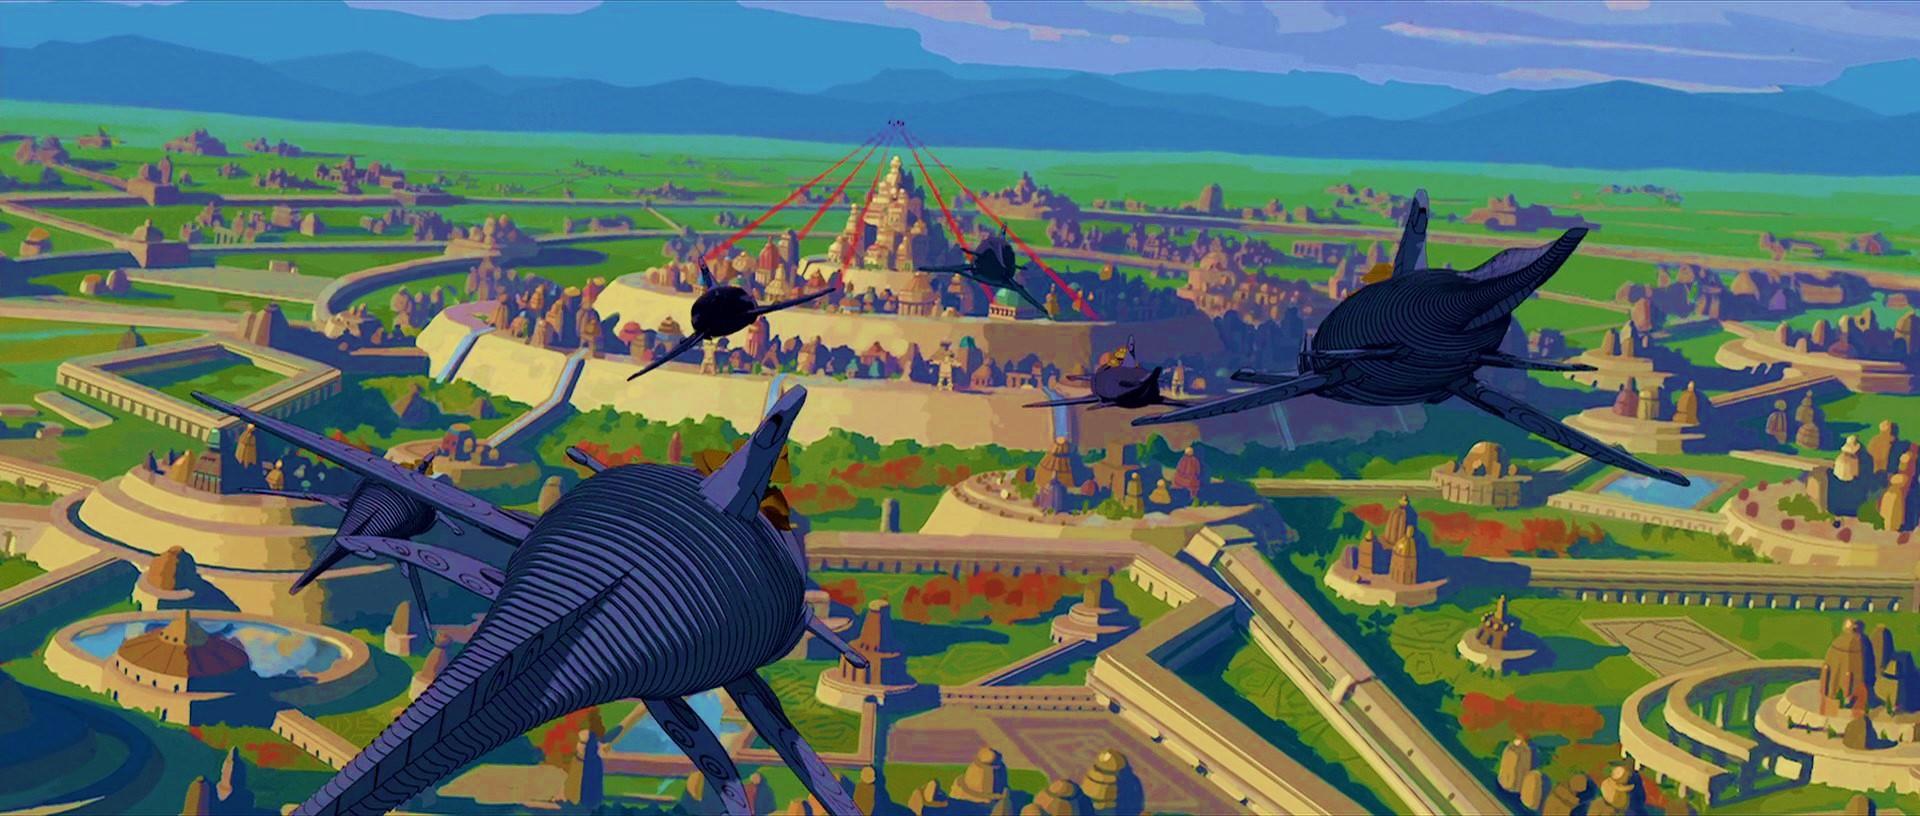 Disney-Atlantis.jpg